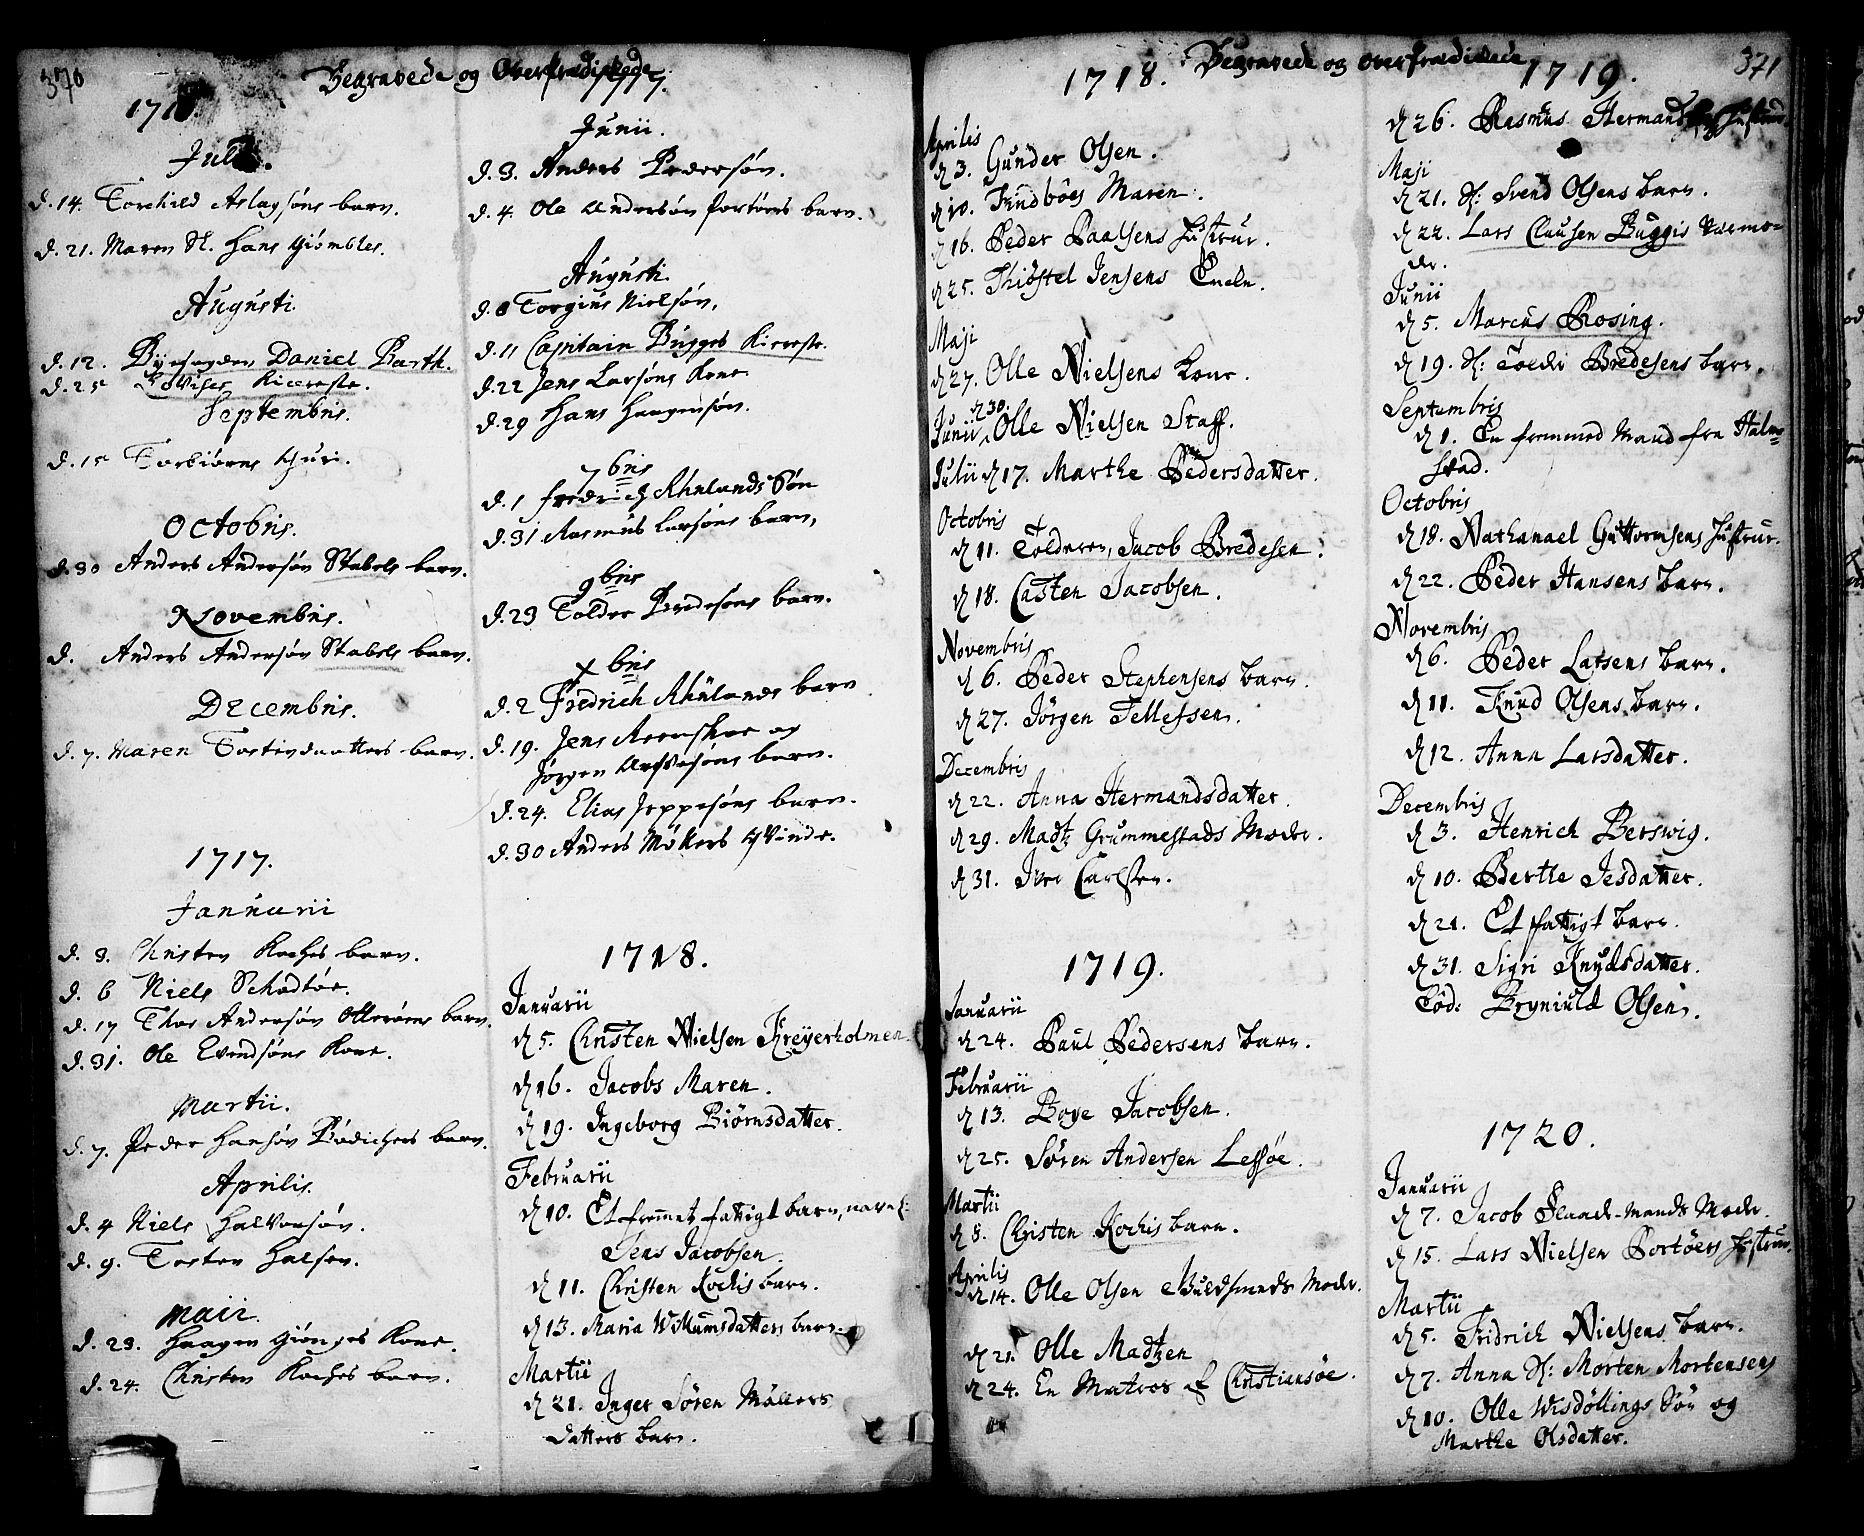 SAKO, Kragerø kirkebøker, F/Fa/L0001: Ministerialbok nr. 1, 1702-1766, s. 370-371